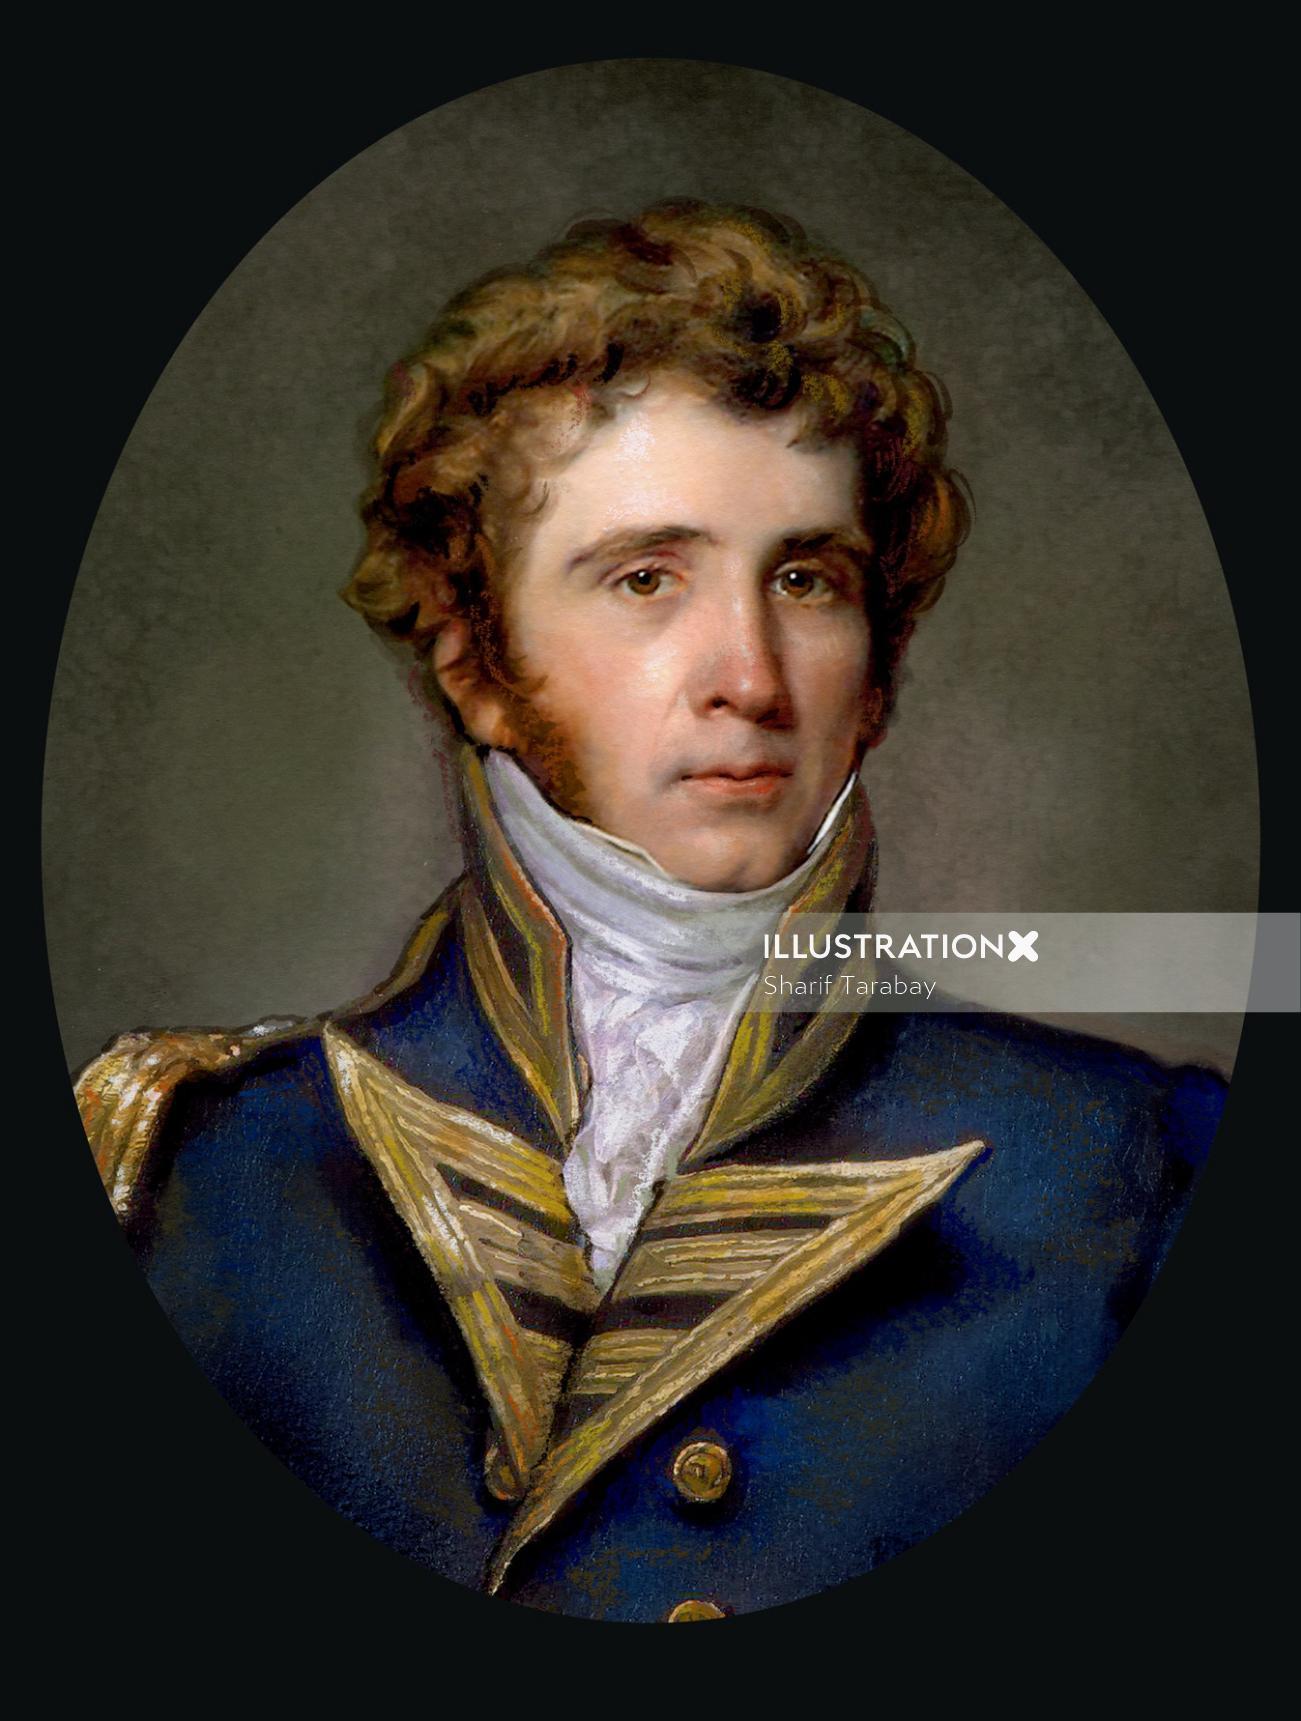 Portrait illustration of English man